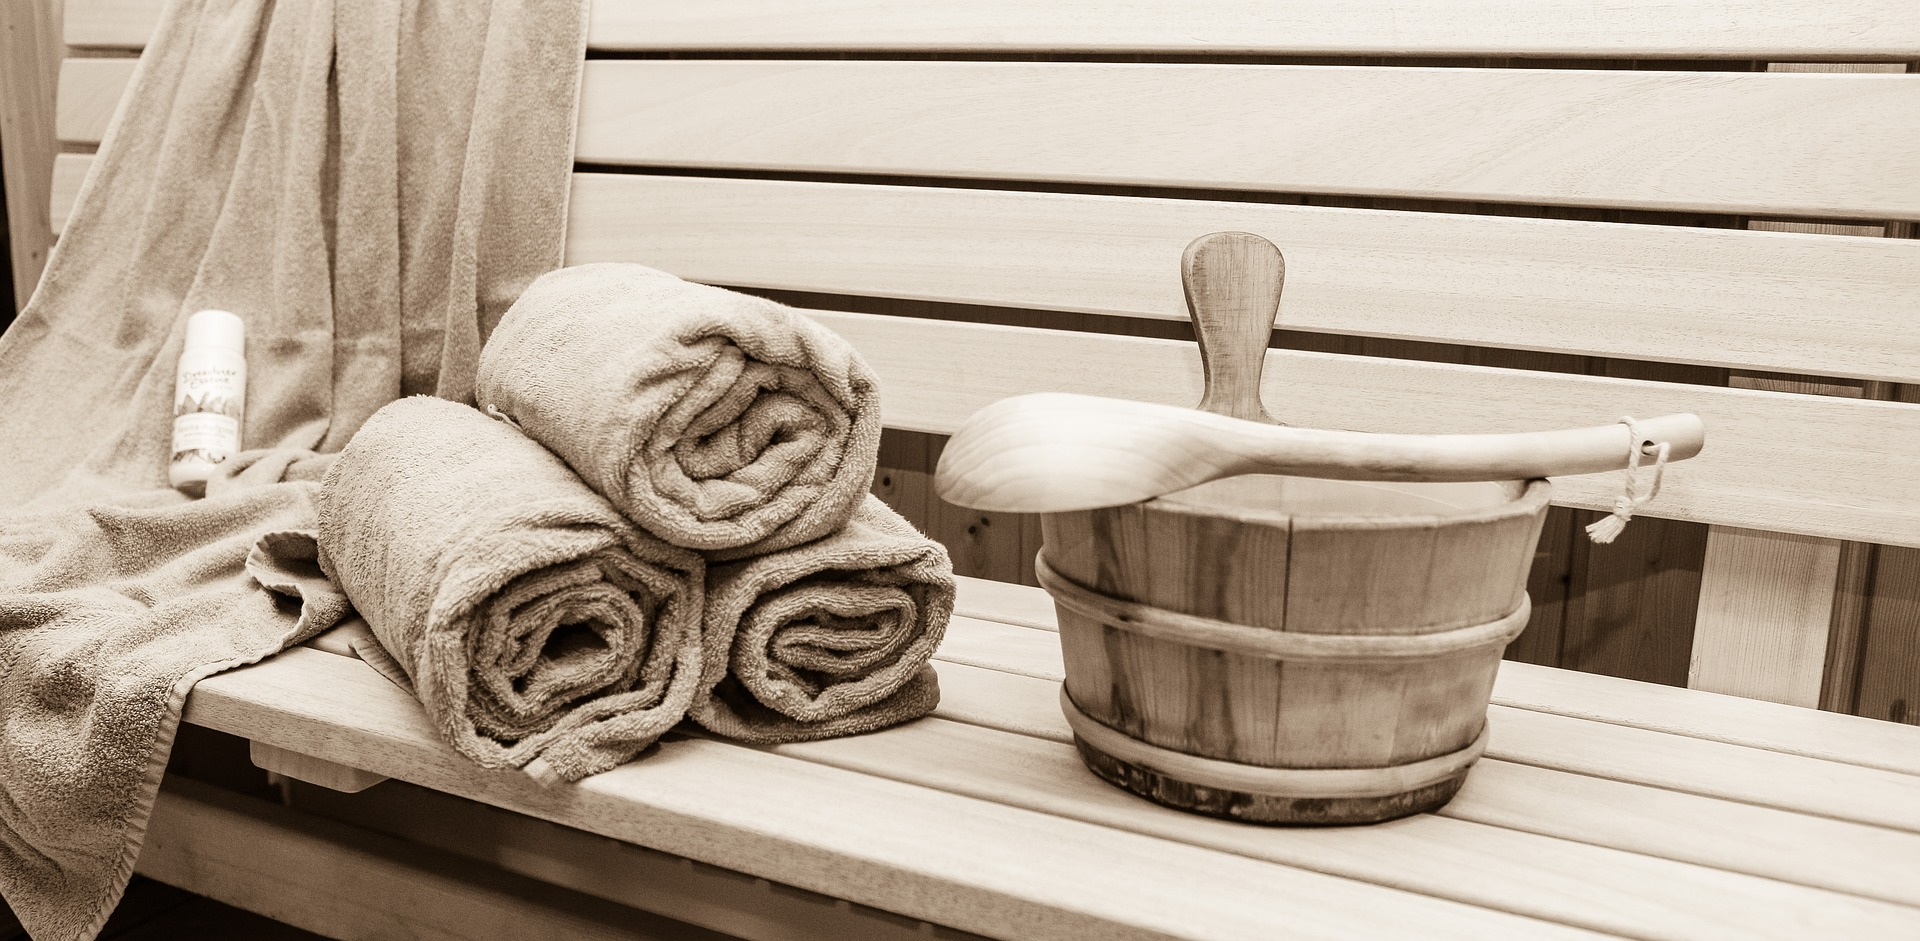 sauna-2844862_1920.jpg